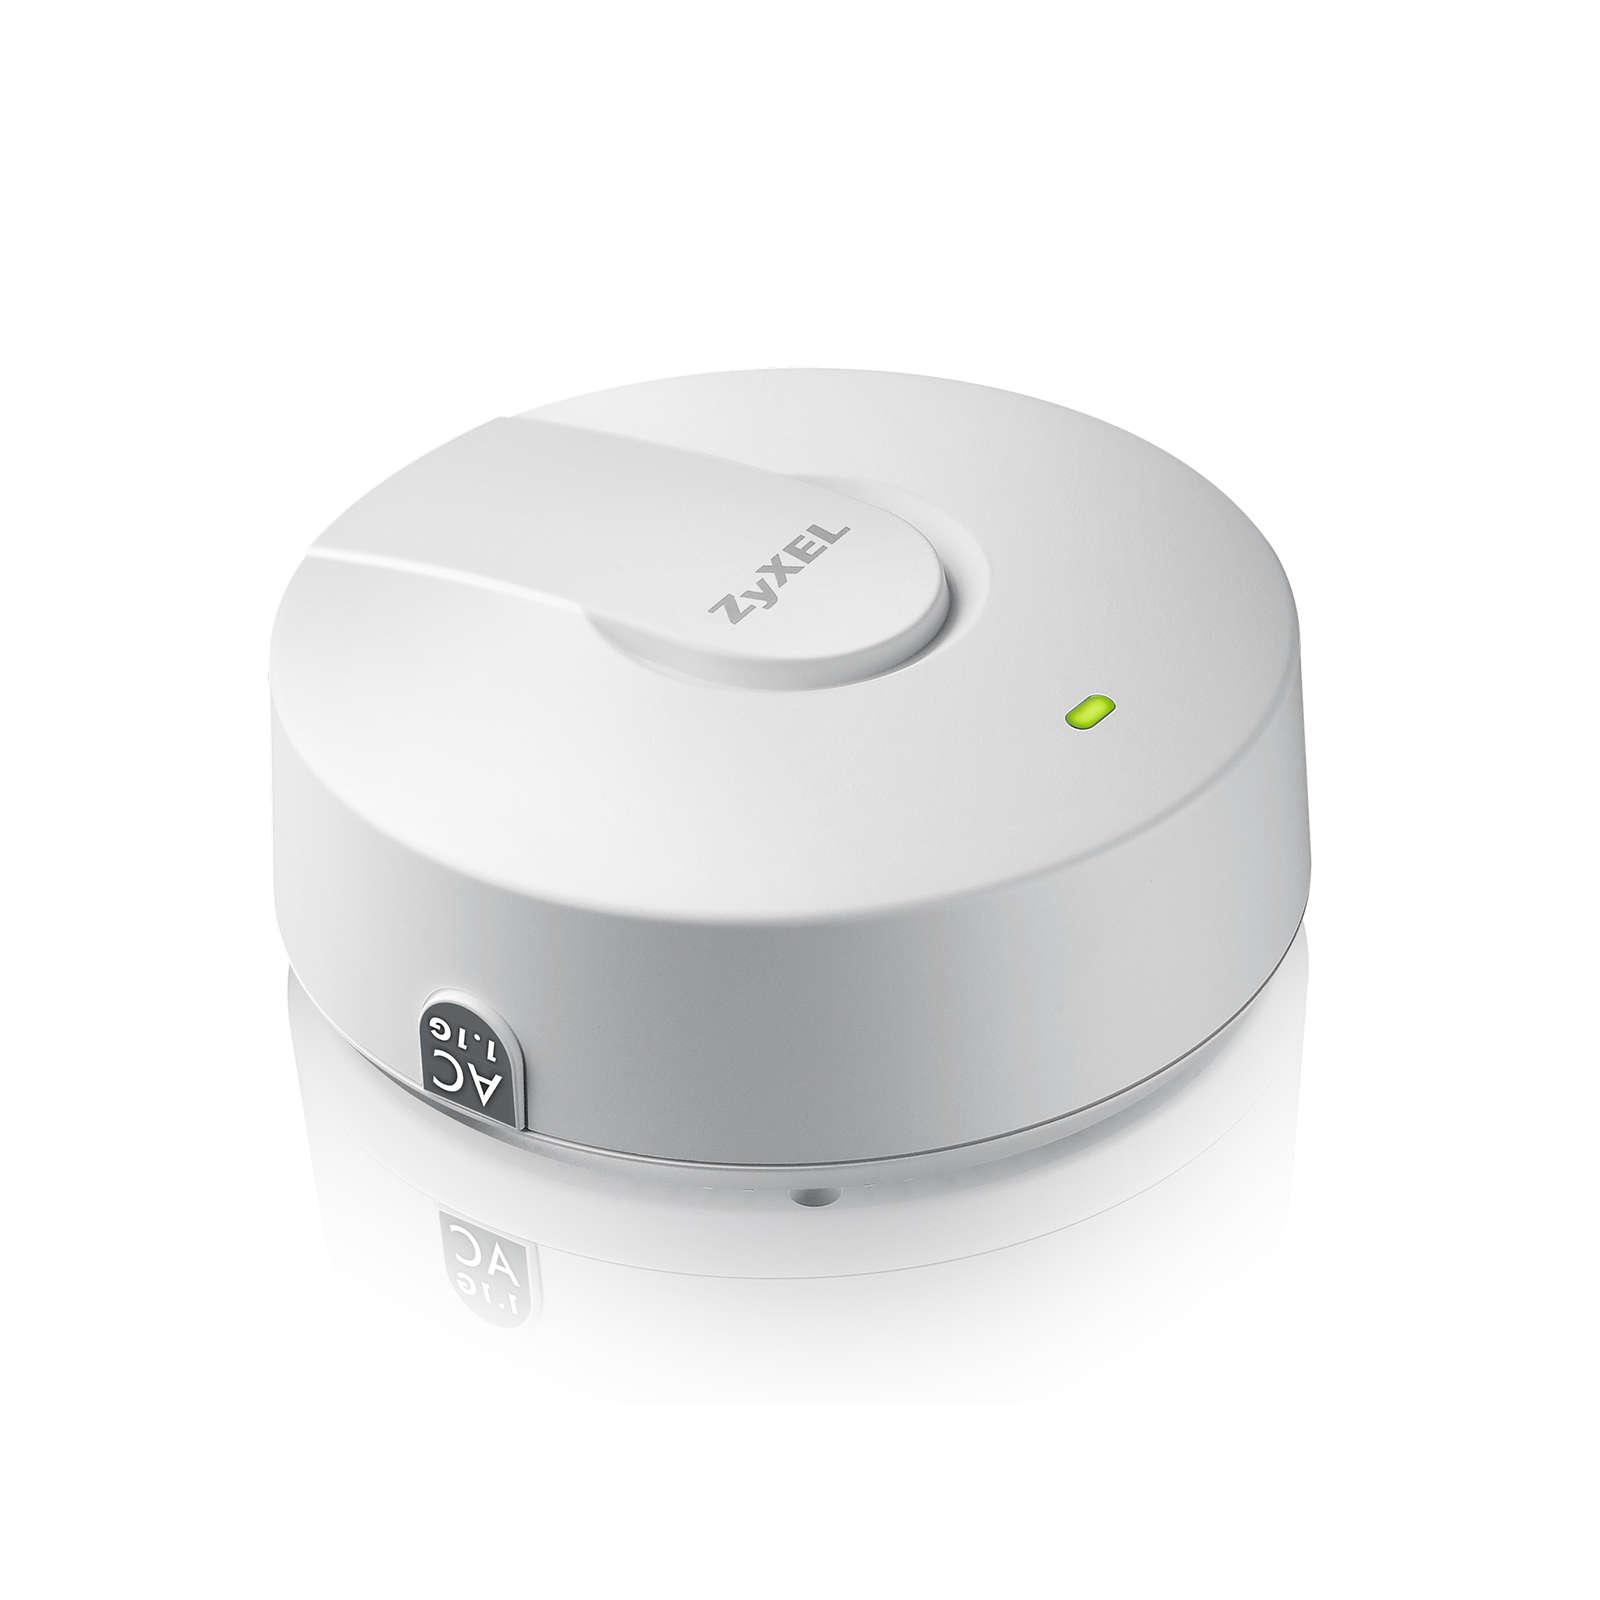 Point d'accès WiFi ZyXEL NWA1123-AC Point d'accès intérieur WiFi AC1200 (N300+AC900) (Dual Radio)